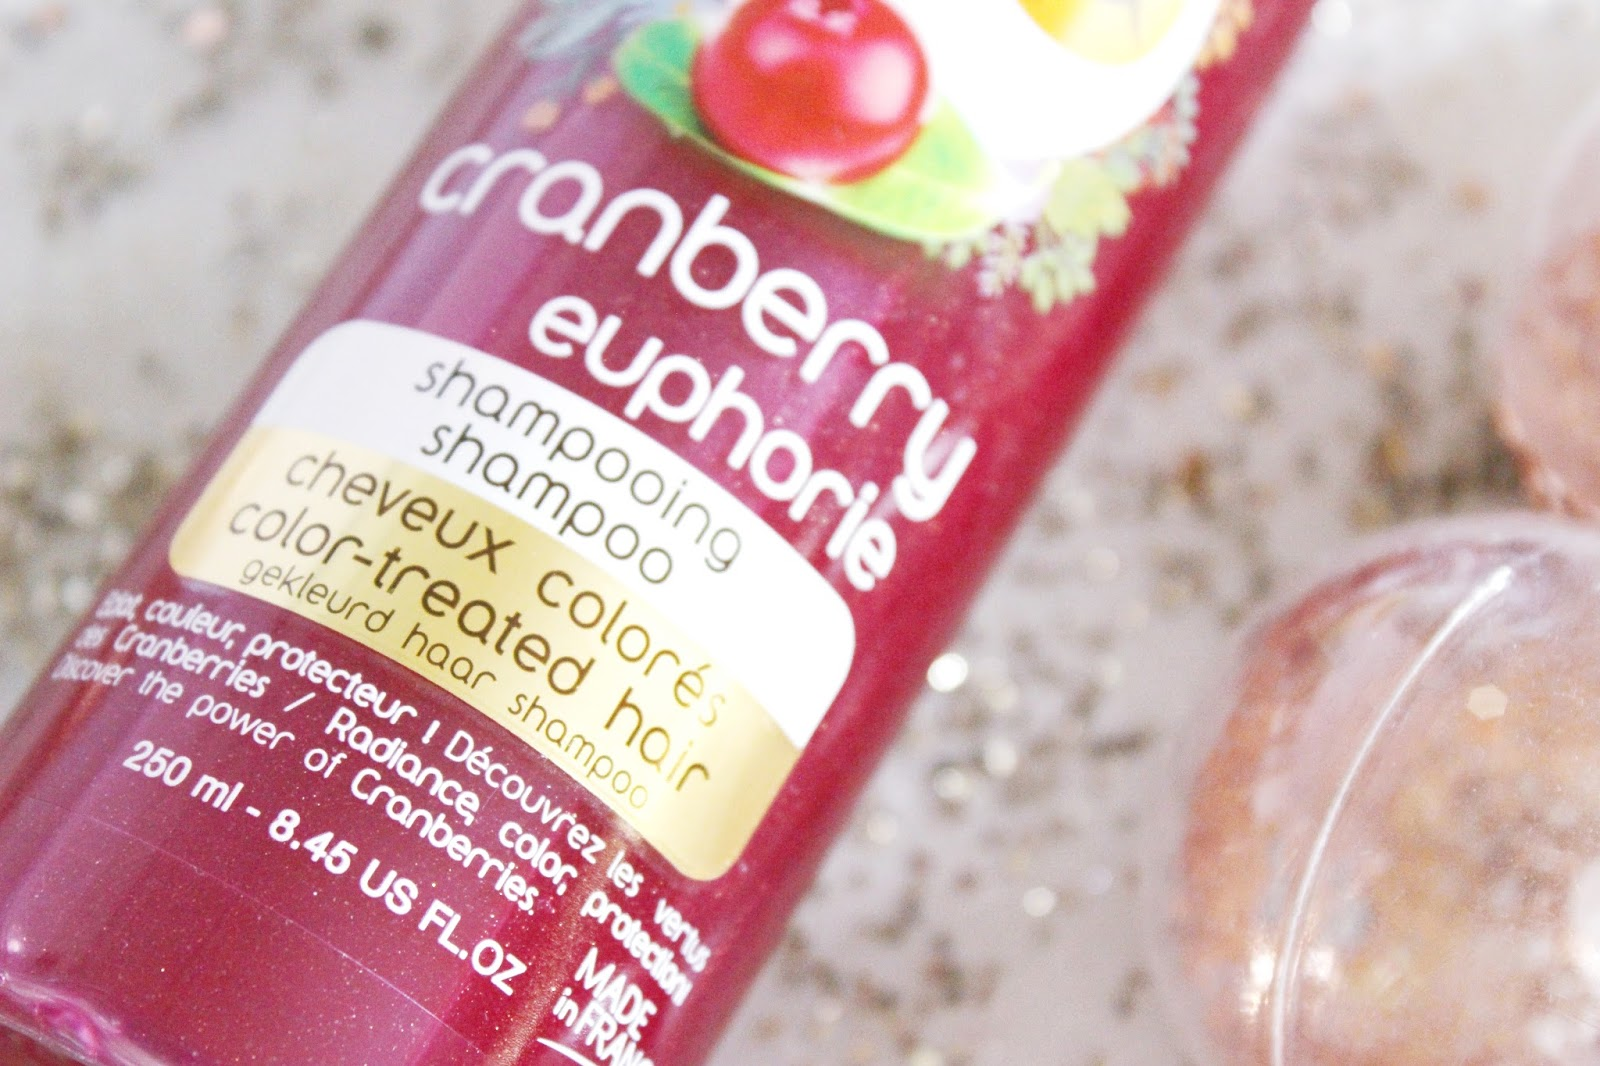 Lovea shampoing Coco & Cranberry